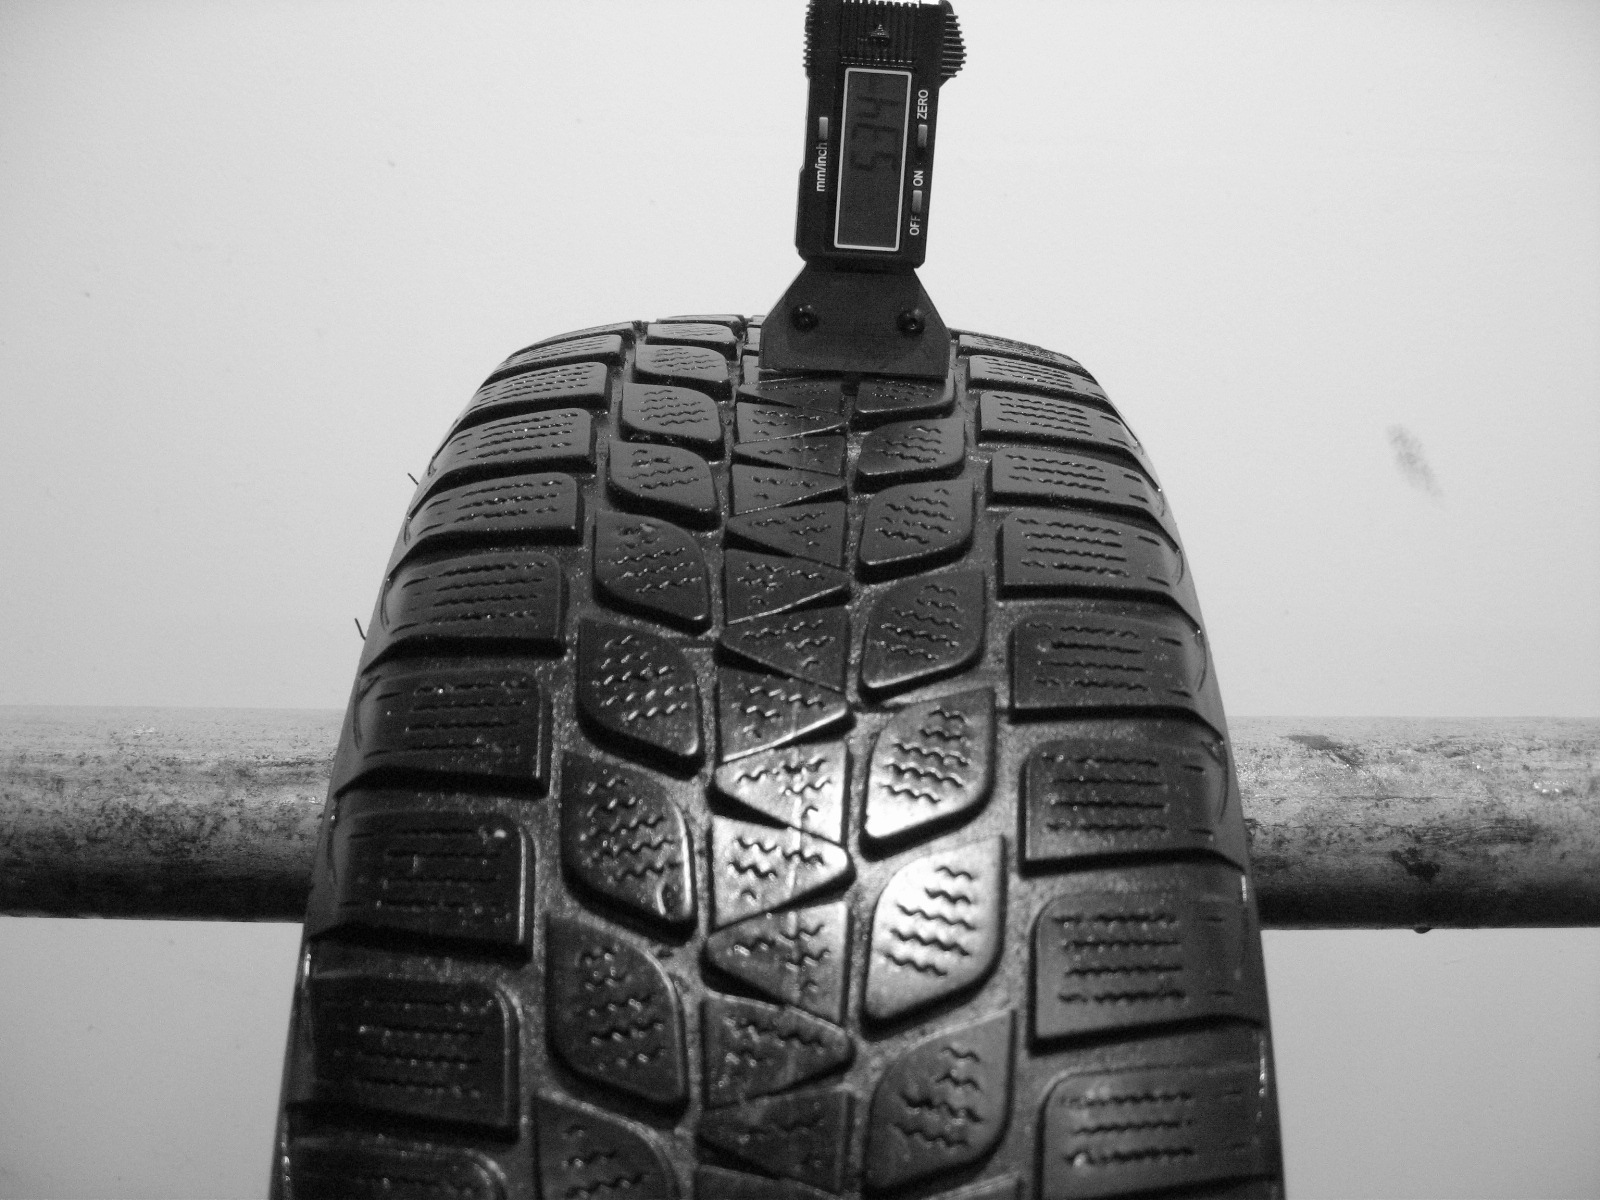 Použité-Pneu-Bazar - 185/60 R15 BRIDGESTONE BLIZZAK LM-20 -kusovka-rezerva 3mm